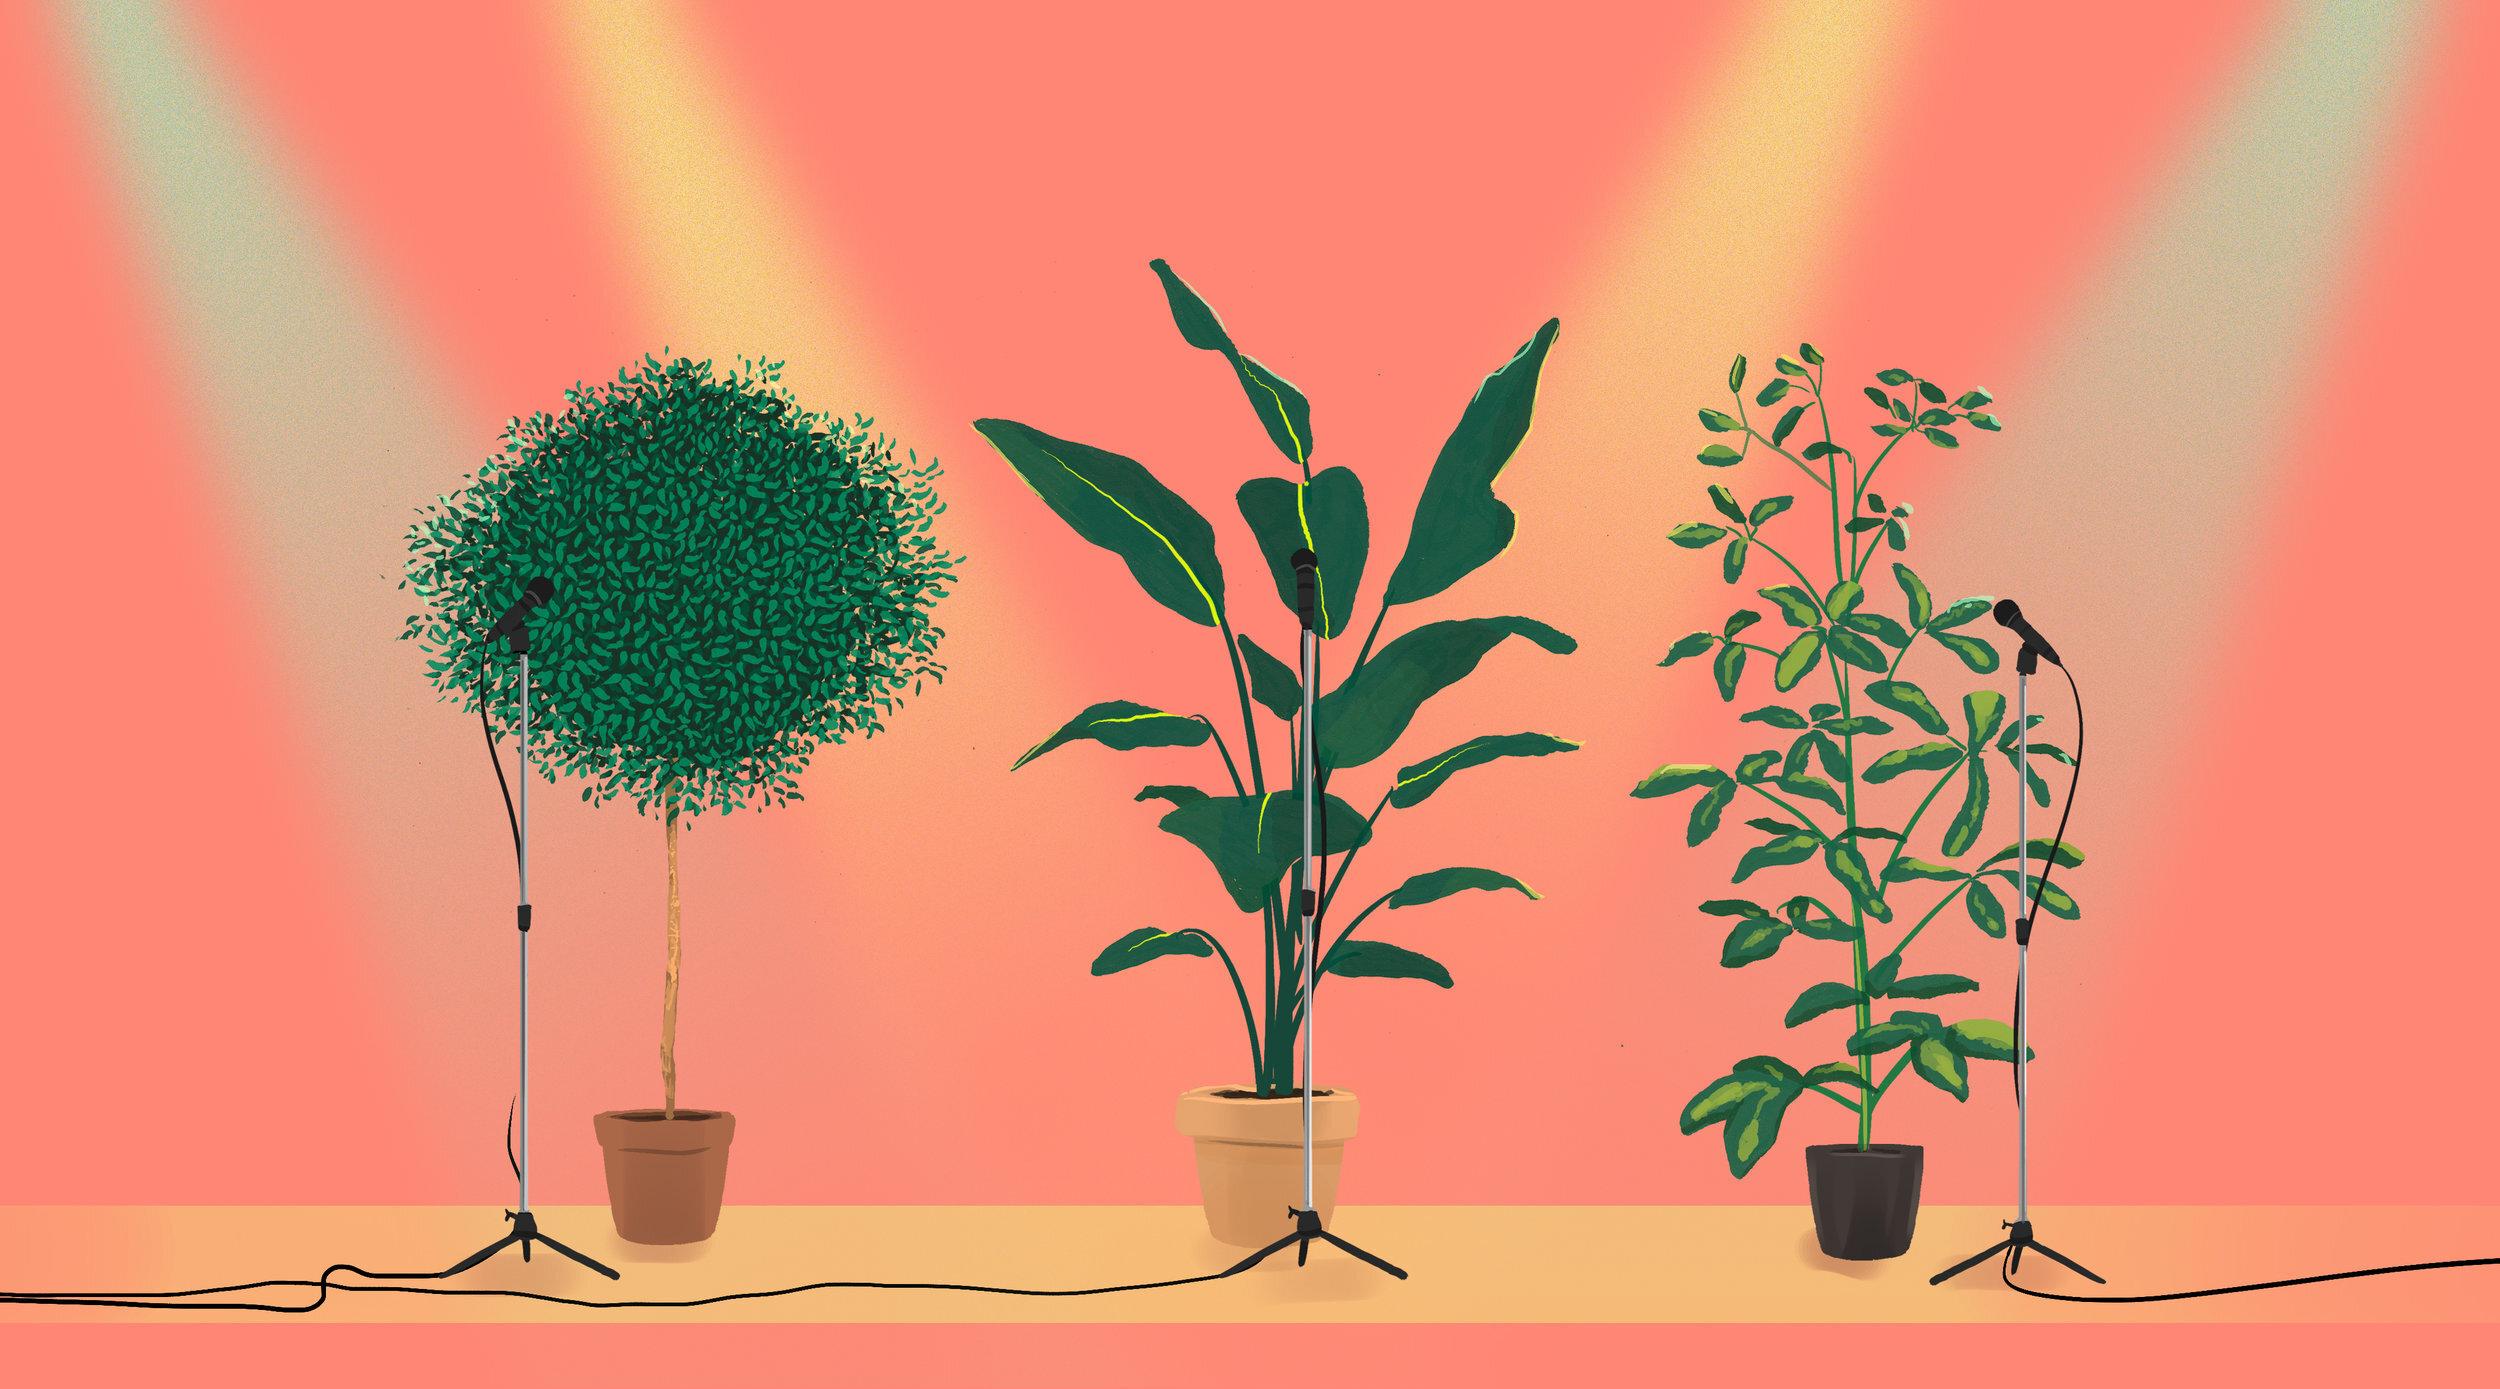 Plants_website_no_text.jpg